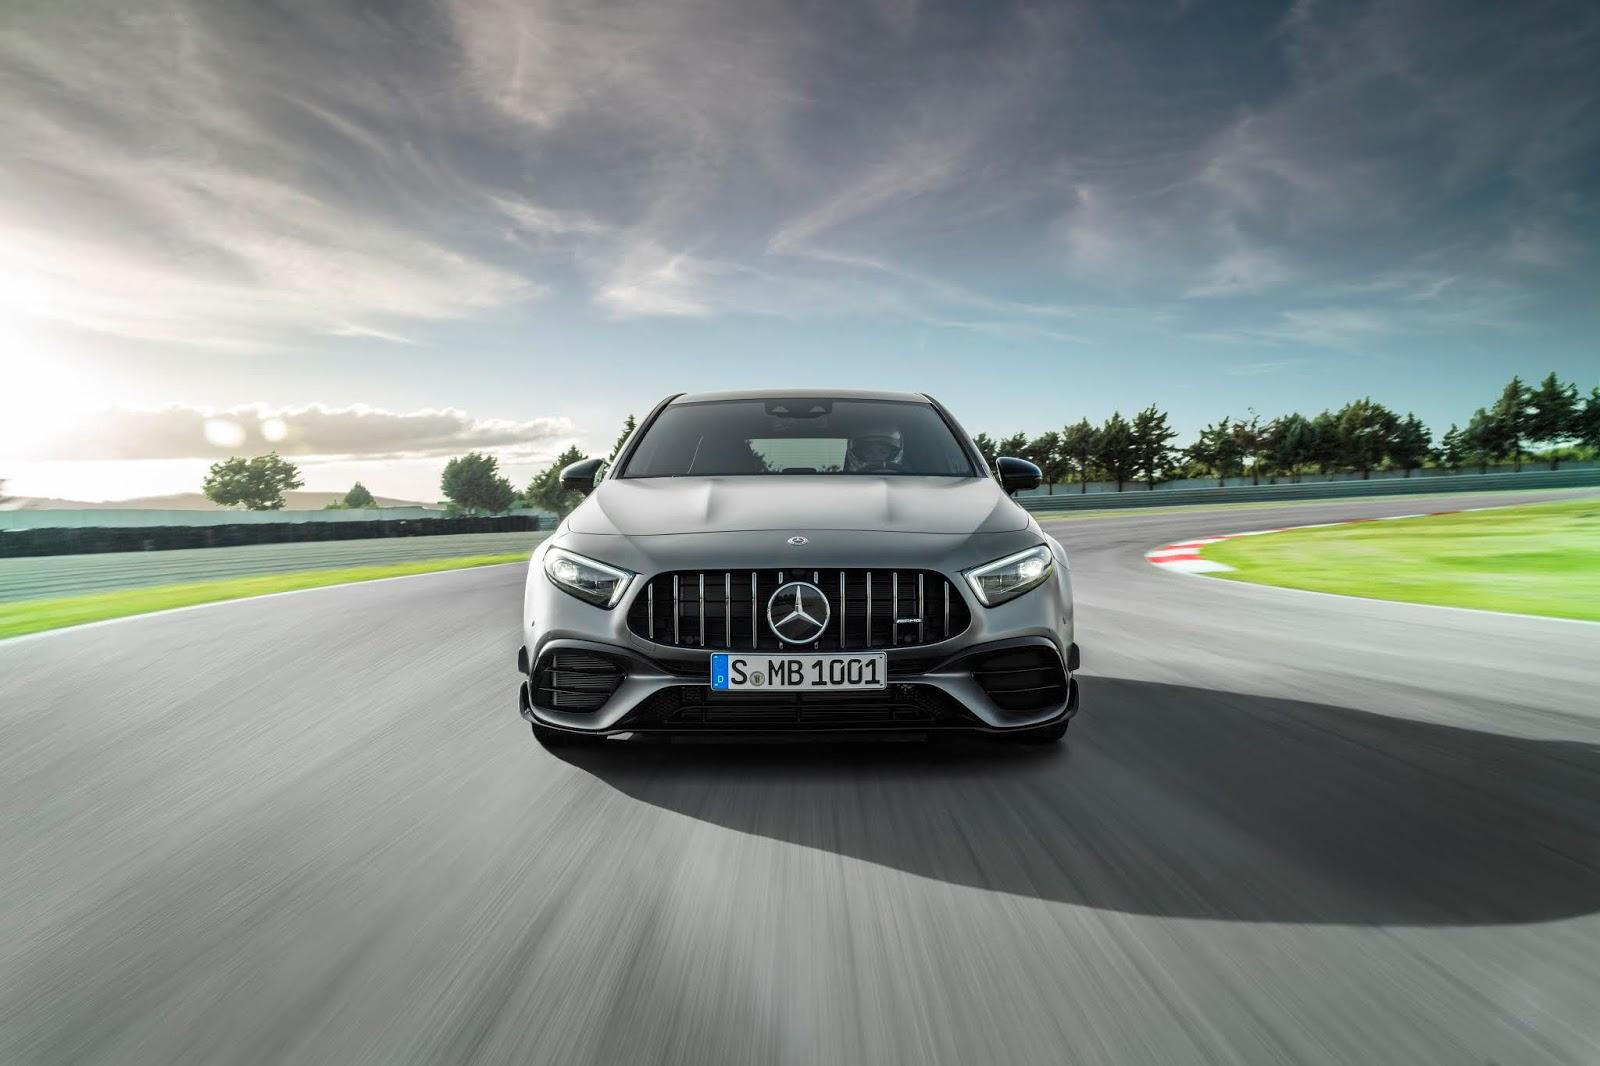 2019 Mercedes-Benz AMG A45 Revealed   VANDI4U